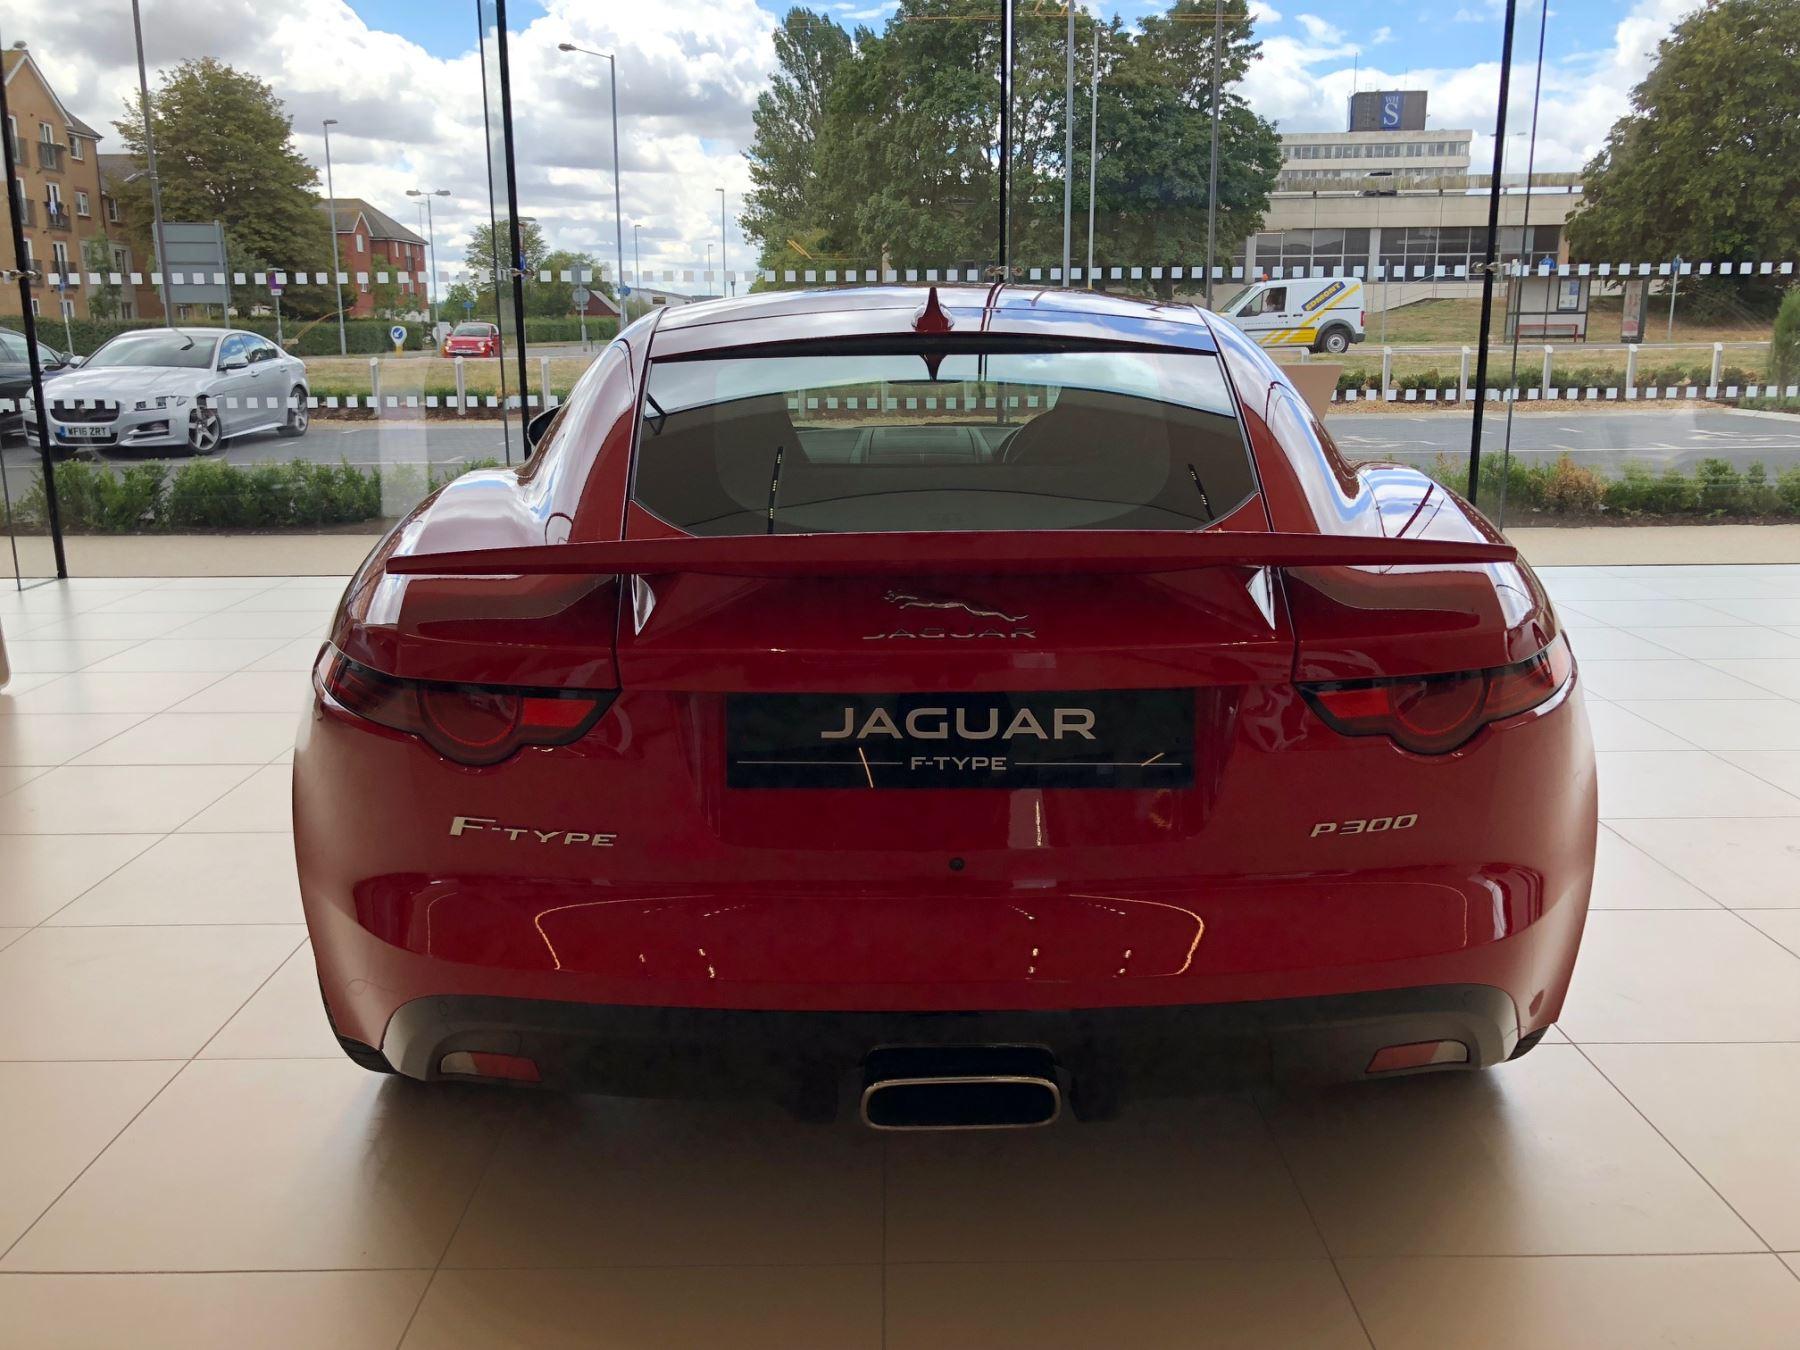 Jaguar F-TYPE 2.0 300PS RWD R-Dynamic image 6